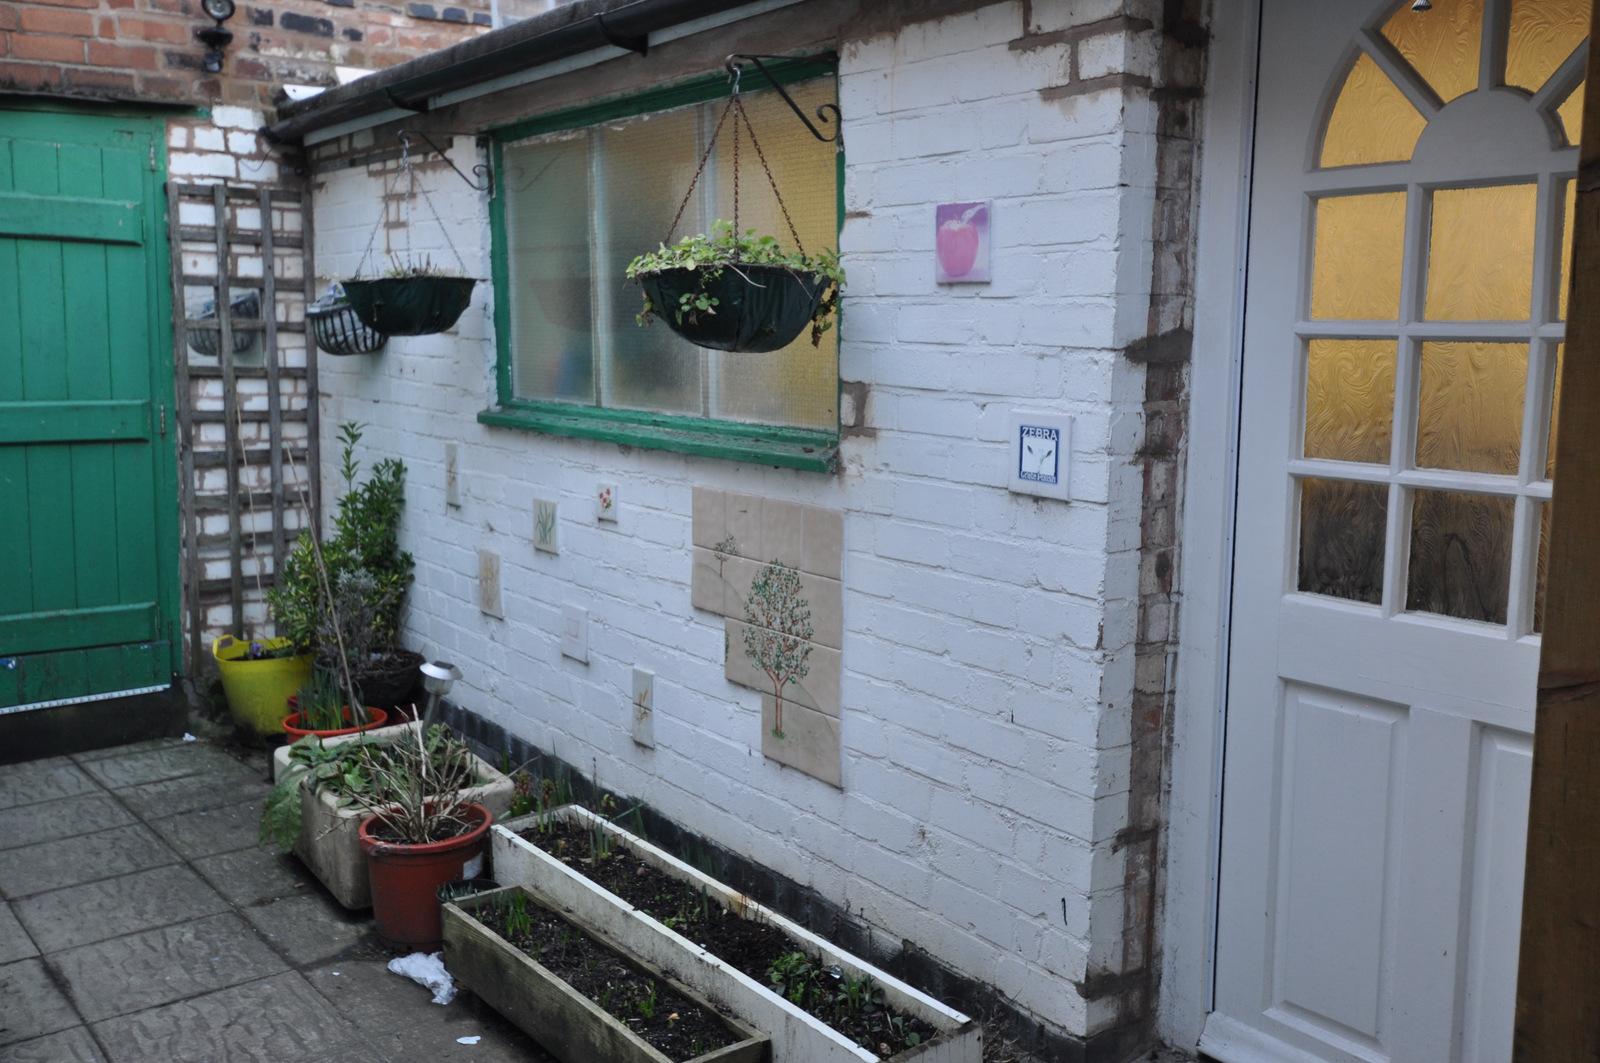 The workshops courtyard